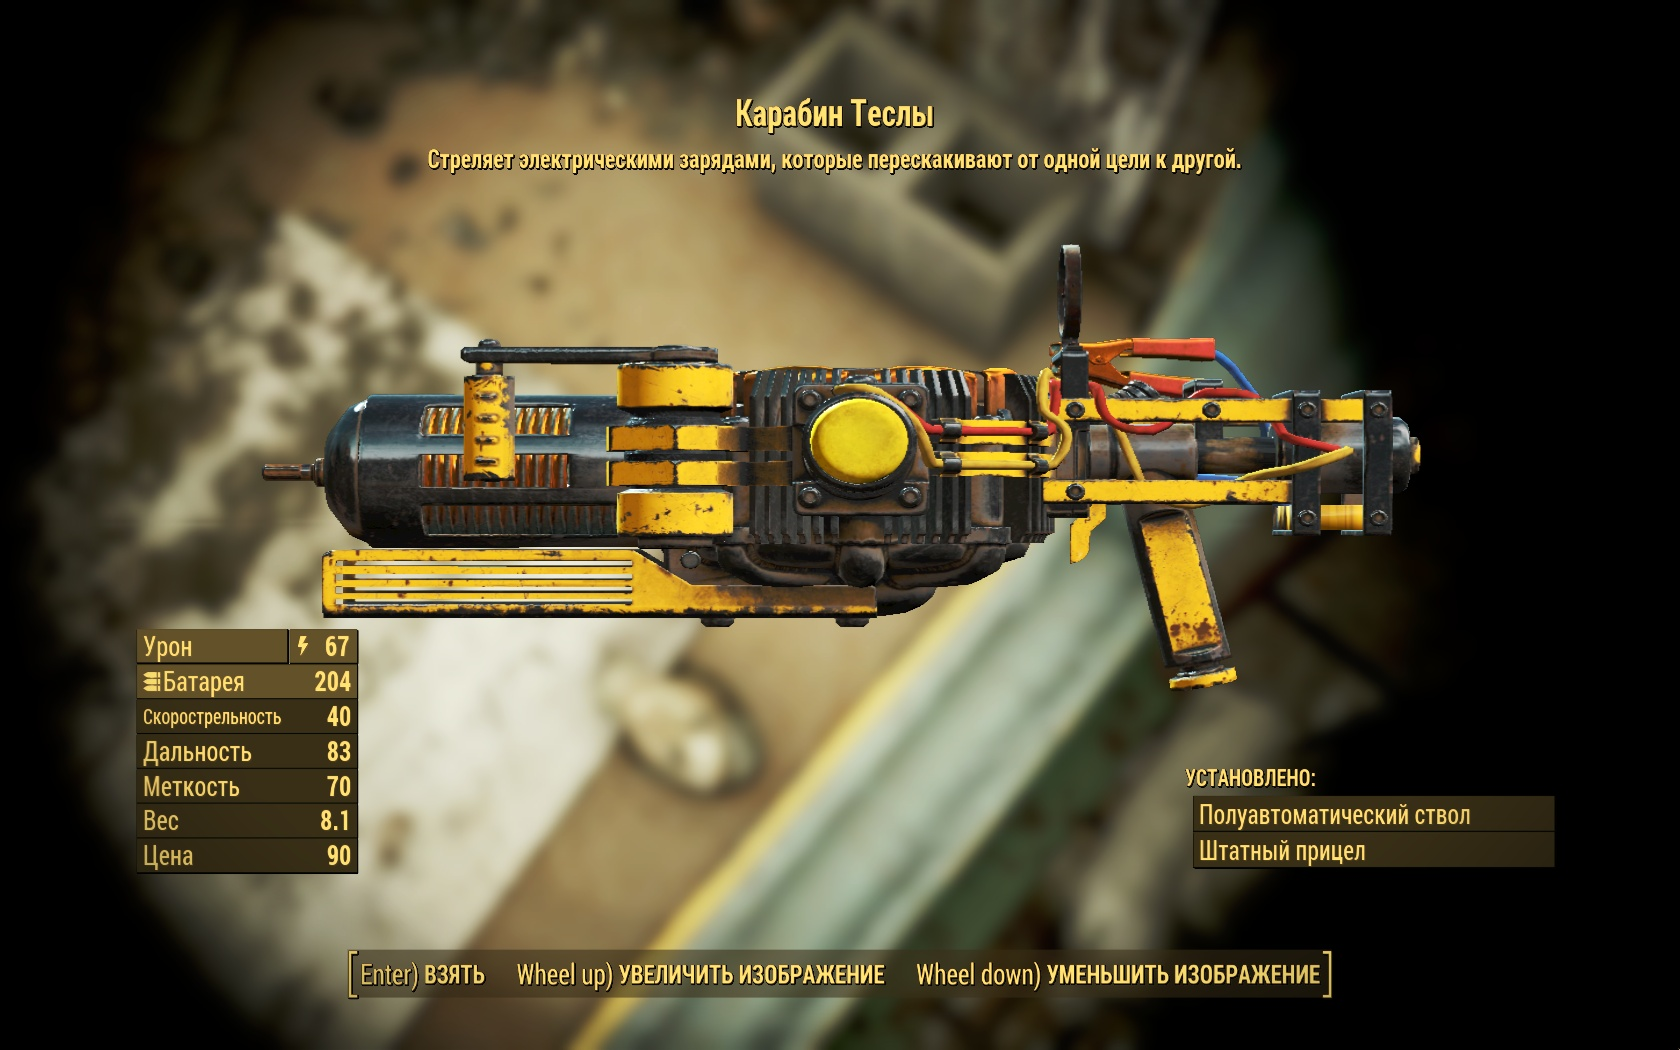 карабин - Fallout 4 антенна, Карабин Теслы, оружие, Спутниковая антенна базы Форт-Хаген, Тесла, Форт-Хаген